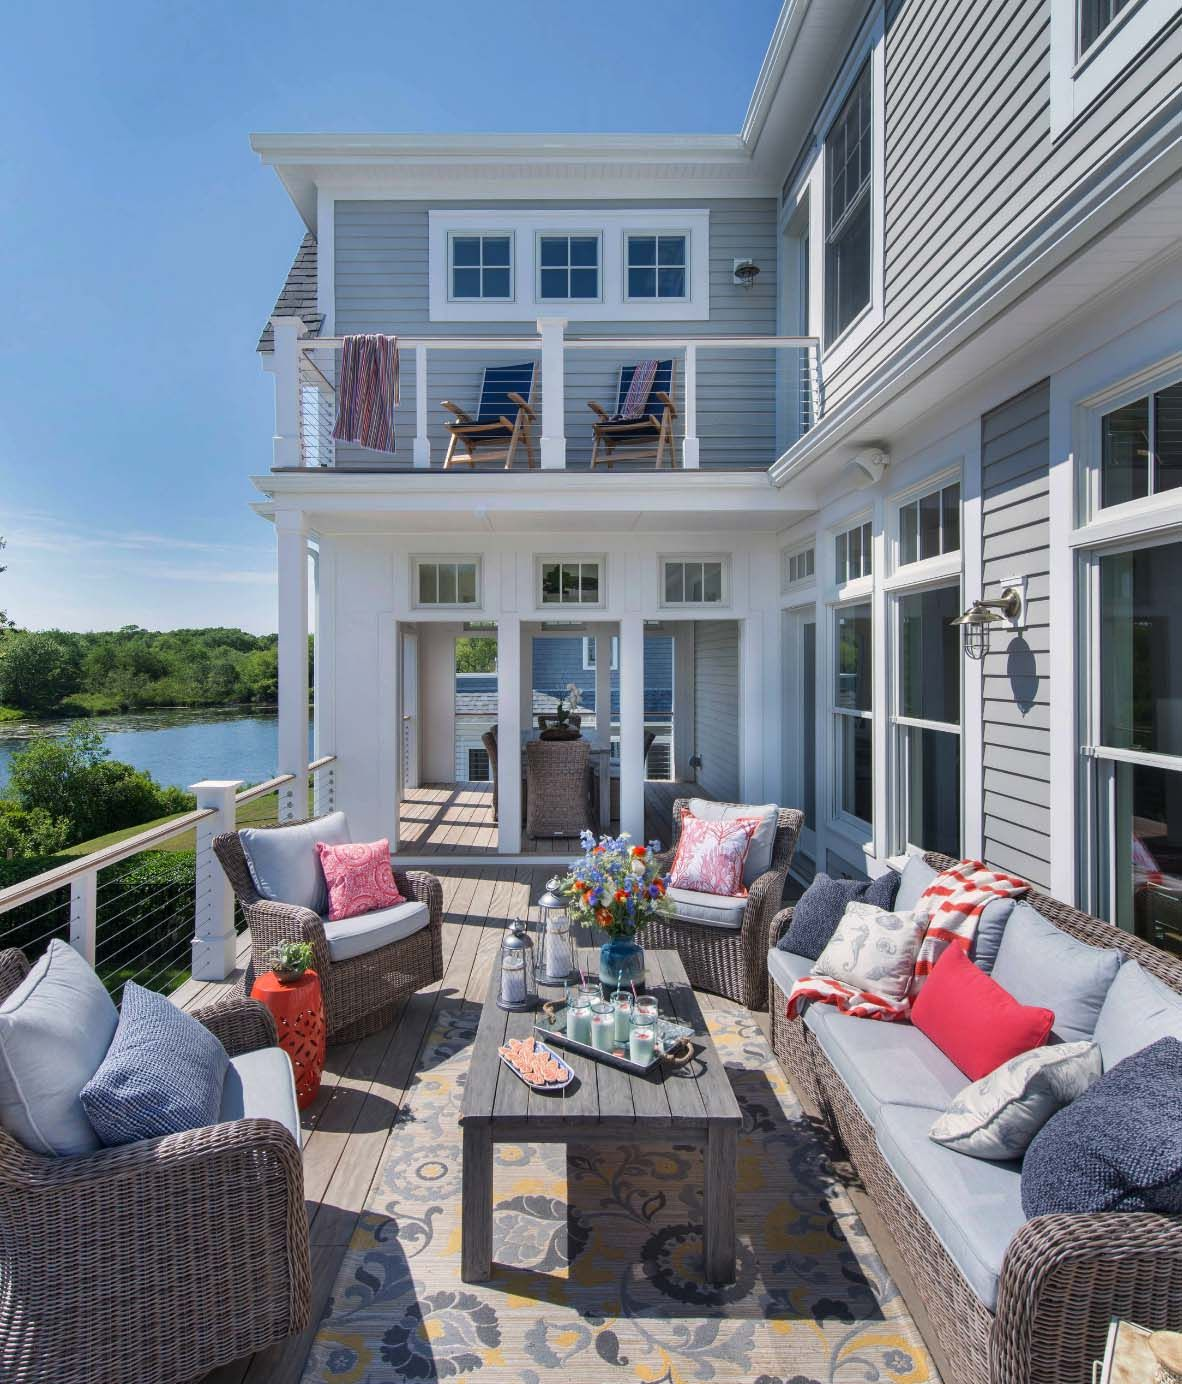 30 Amazing Beach Style Deck Ideas Promoting Relaxation Beach House Design Beach House Furniture Beach House Decor